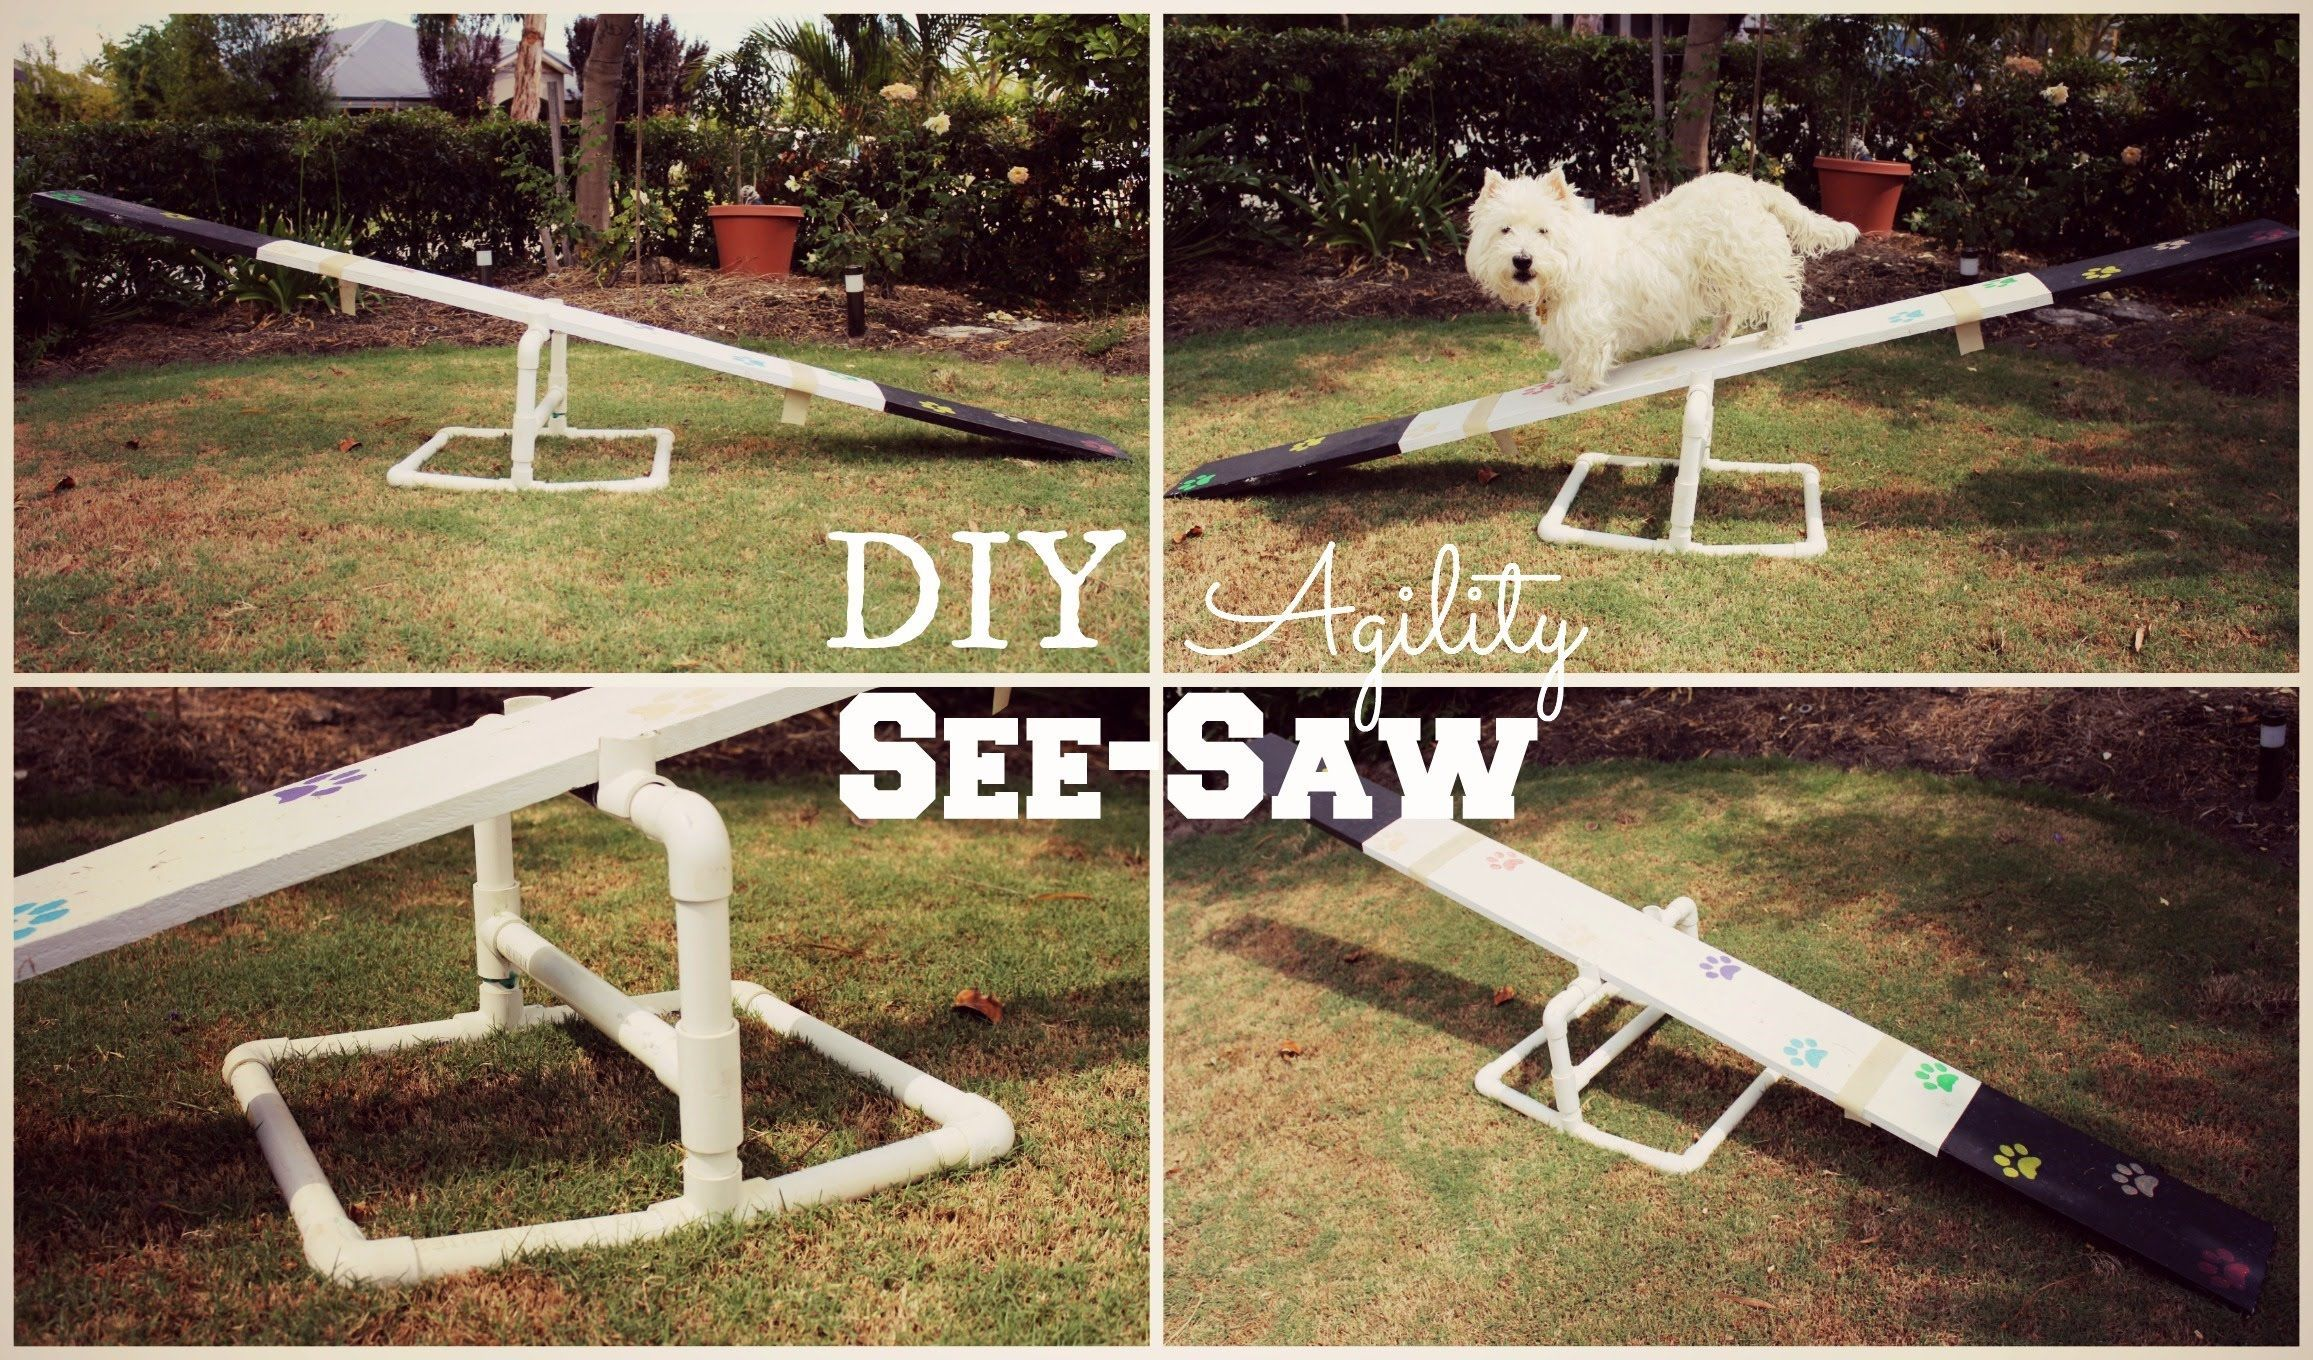 How To Diy Agility See Saw Thedogblog Dog Agility Diy Dog